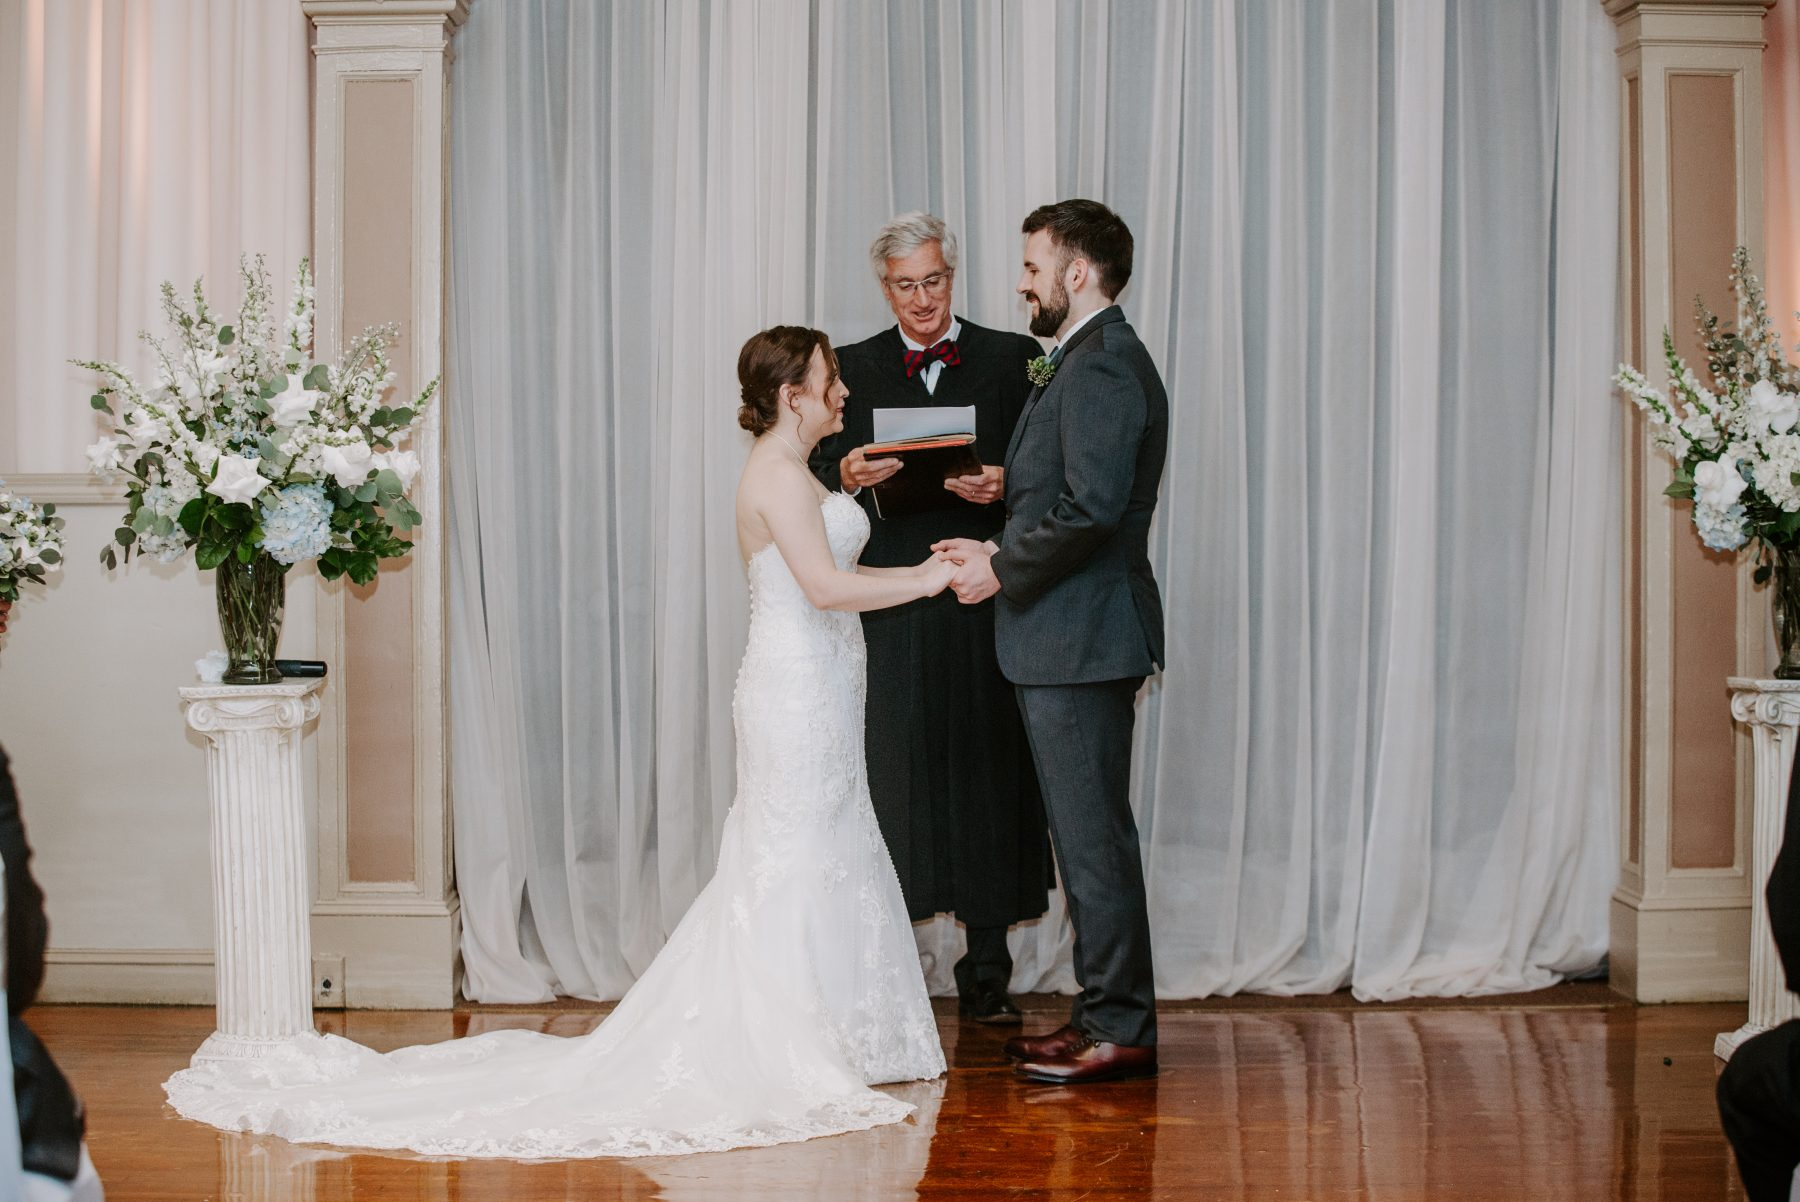 Rhodes on the Pawtuxet Cranston Wedding Ashley and David Blueflash Photography 14